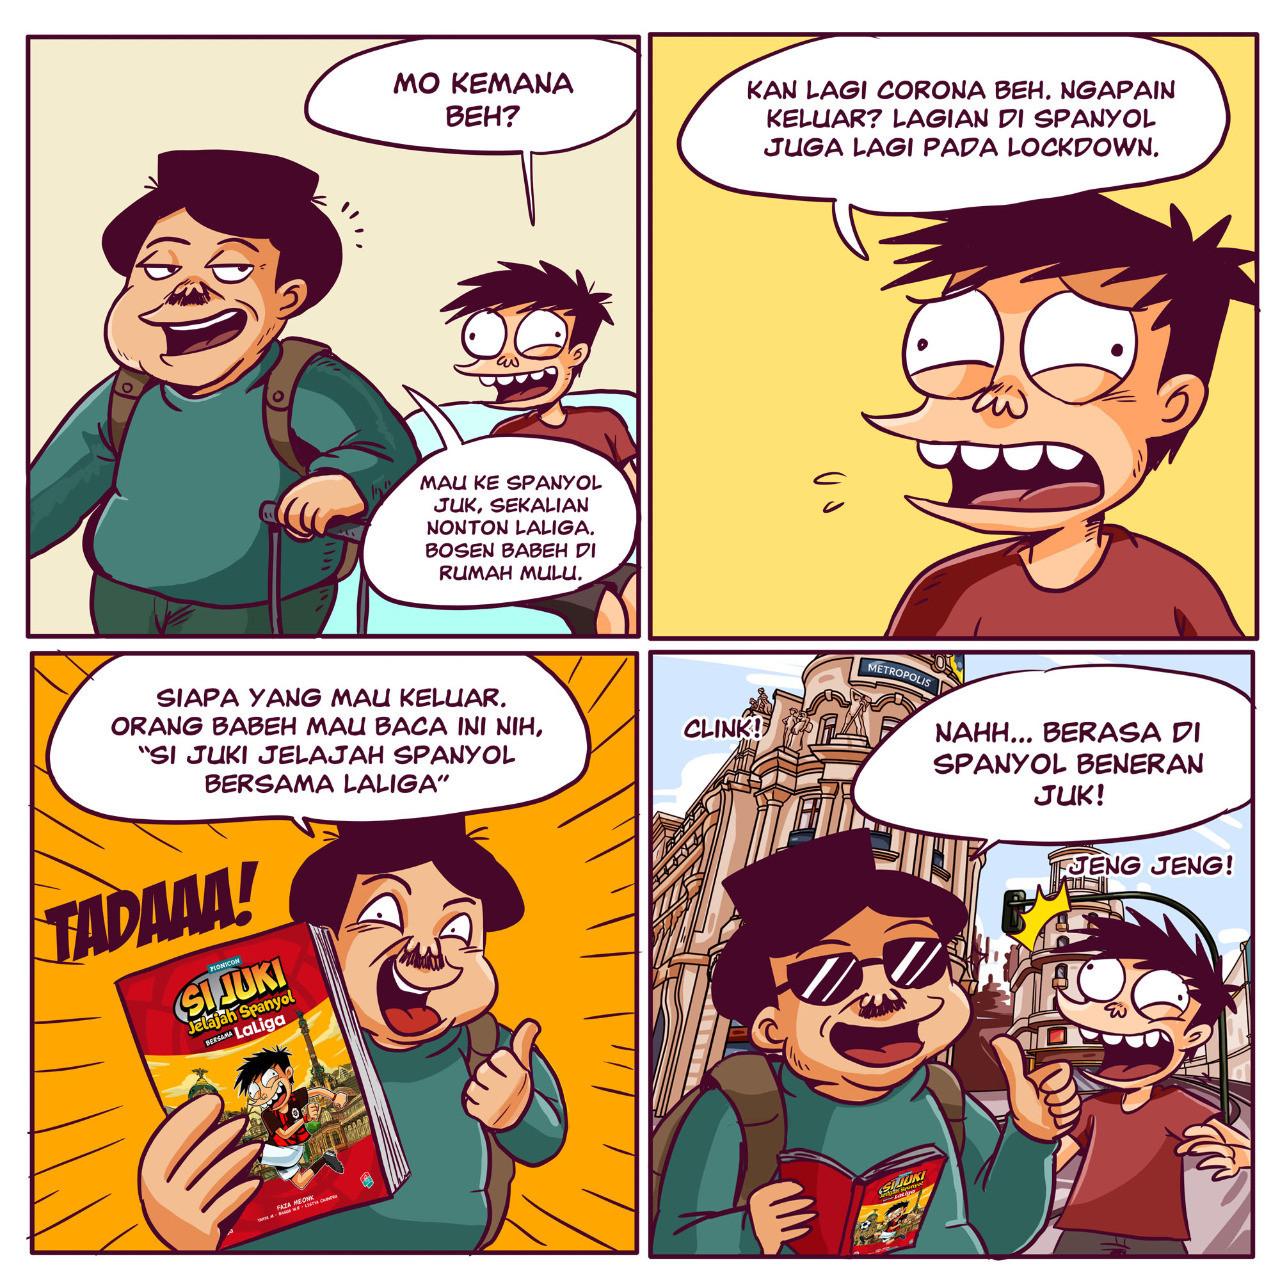 Si Juki lands in Spain, explores La Liga in new comic to promote social distancing